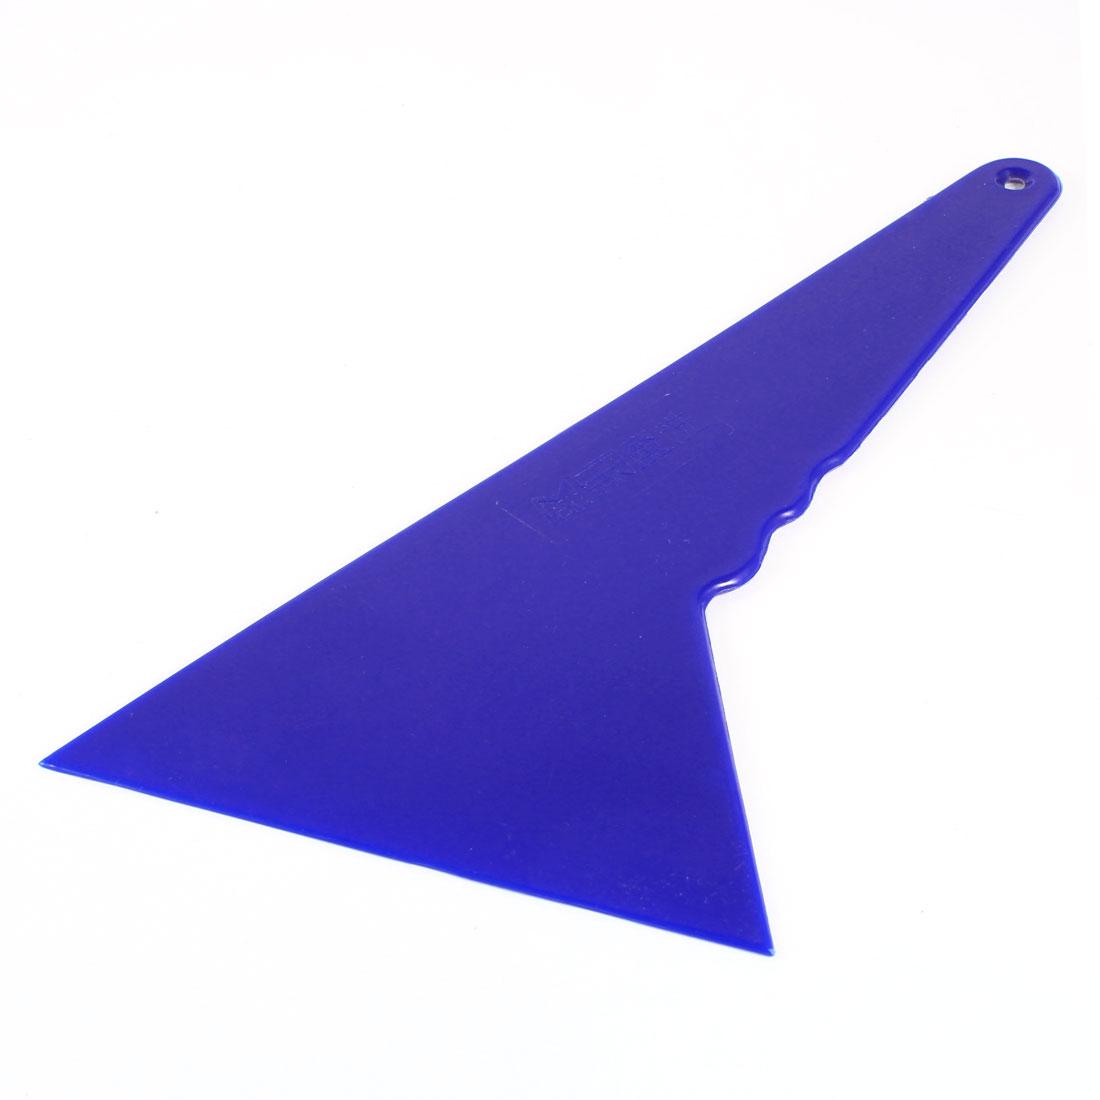 "Car Auto Blue Plastic Windscreen Film Scraper Tool 9"" Length"